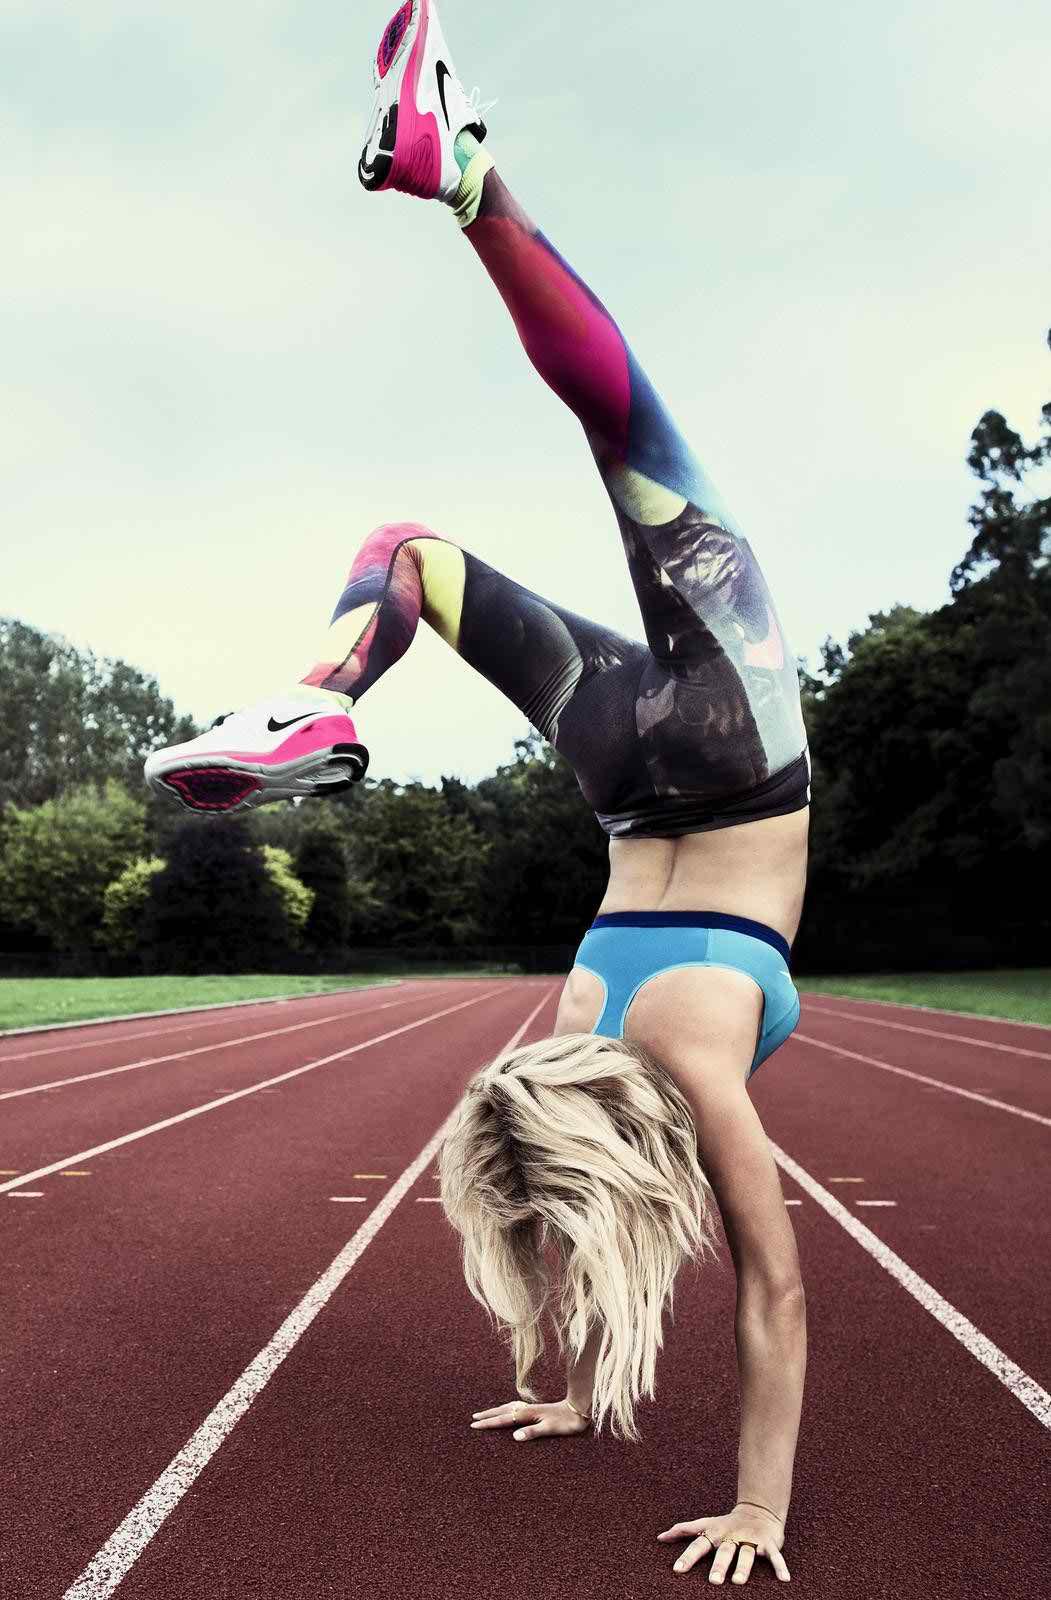 Ellie Goulding's Inspiring New Nike Campaign